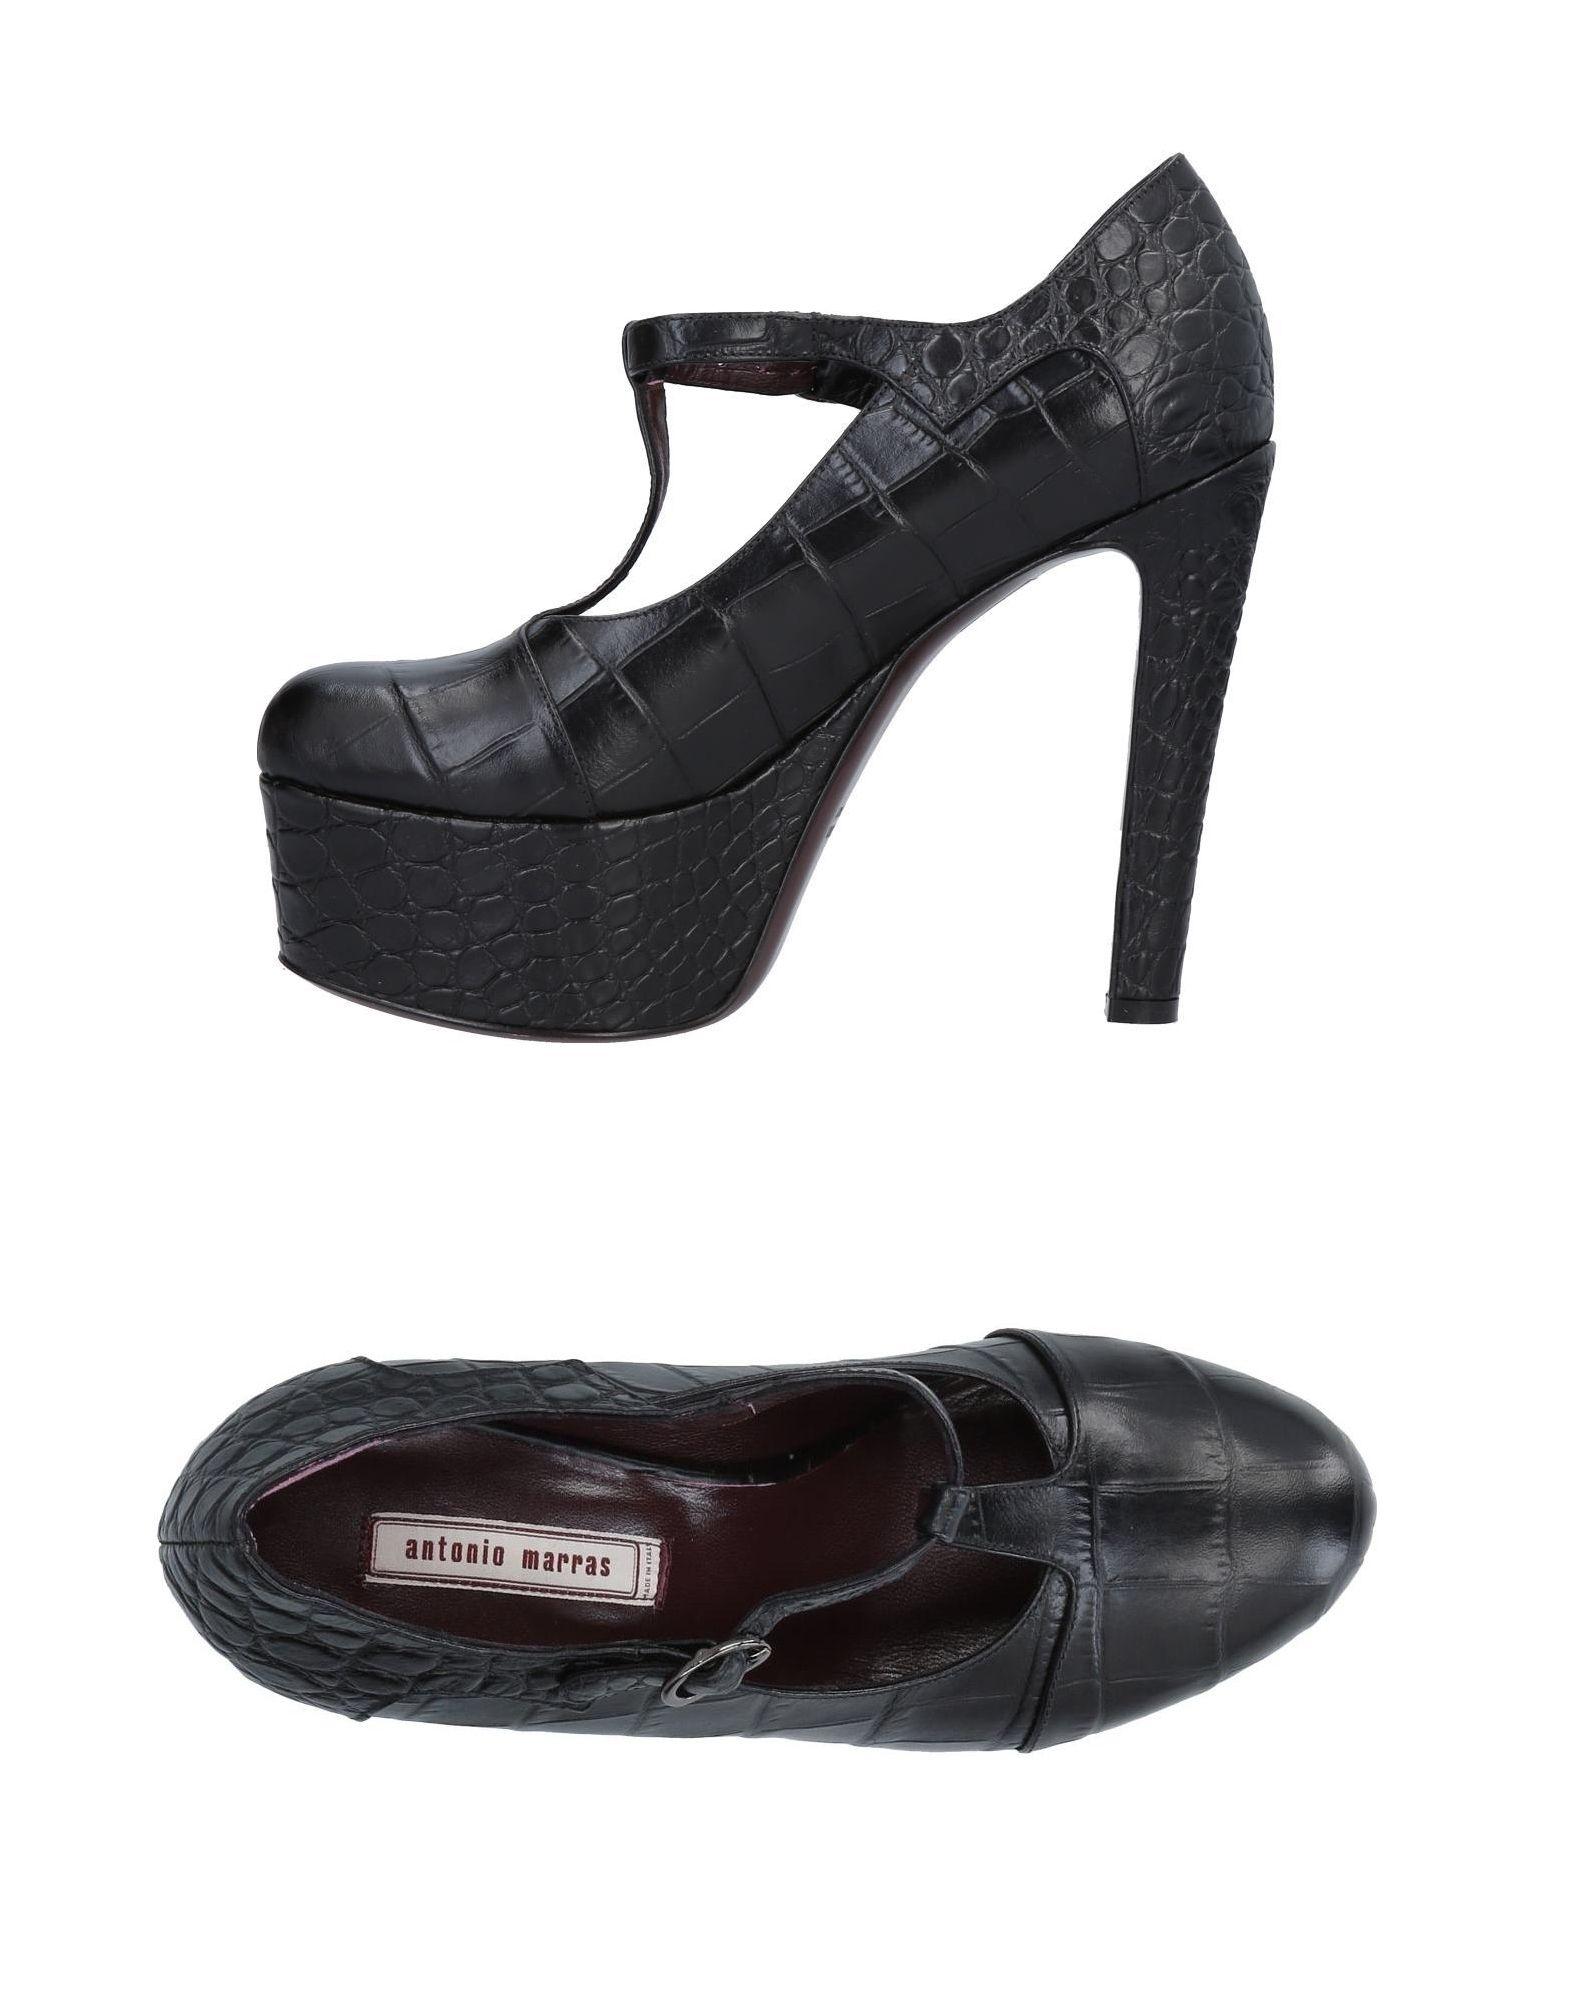 Stilvolle billige Schuhe Damen Antonio Marras Pumps Damen Schuhe  11488273QW ca3b42